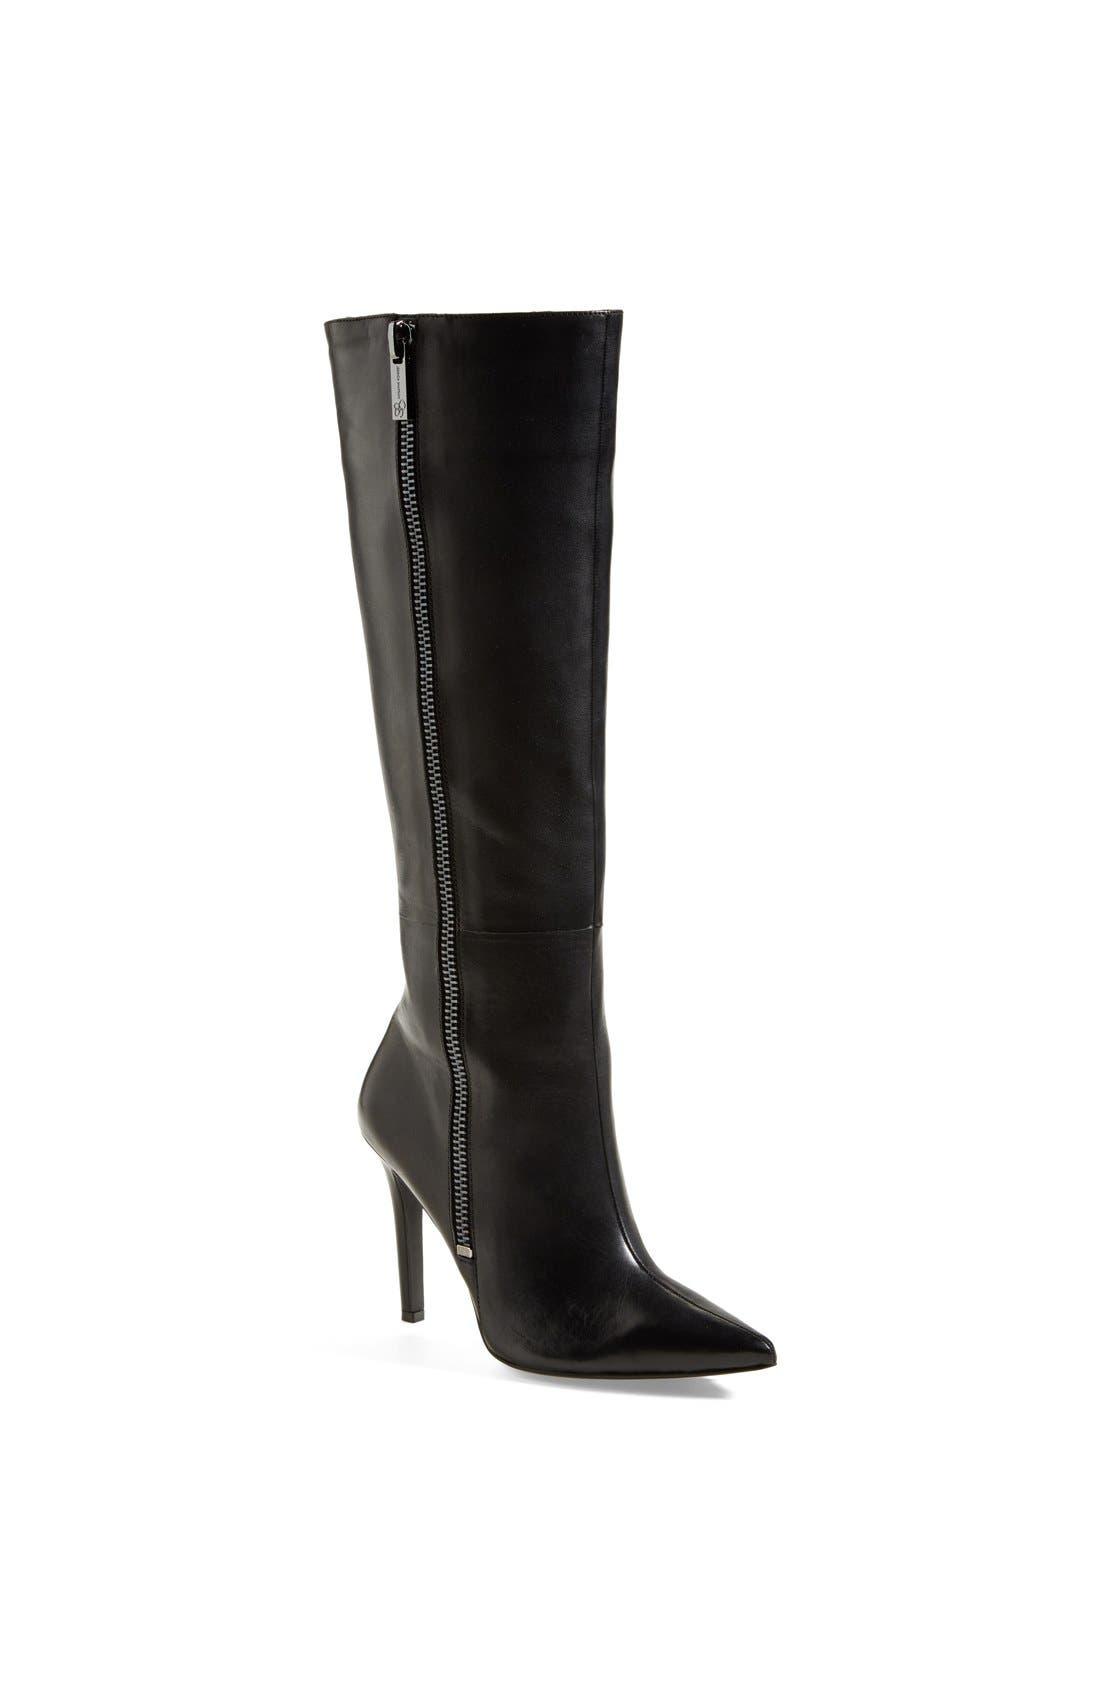 Alternate Image 1 Selected - Jessica Simpson 'Capitani' Pointy Toe Knee High Boot (Women)